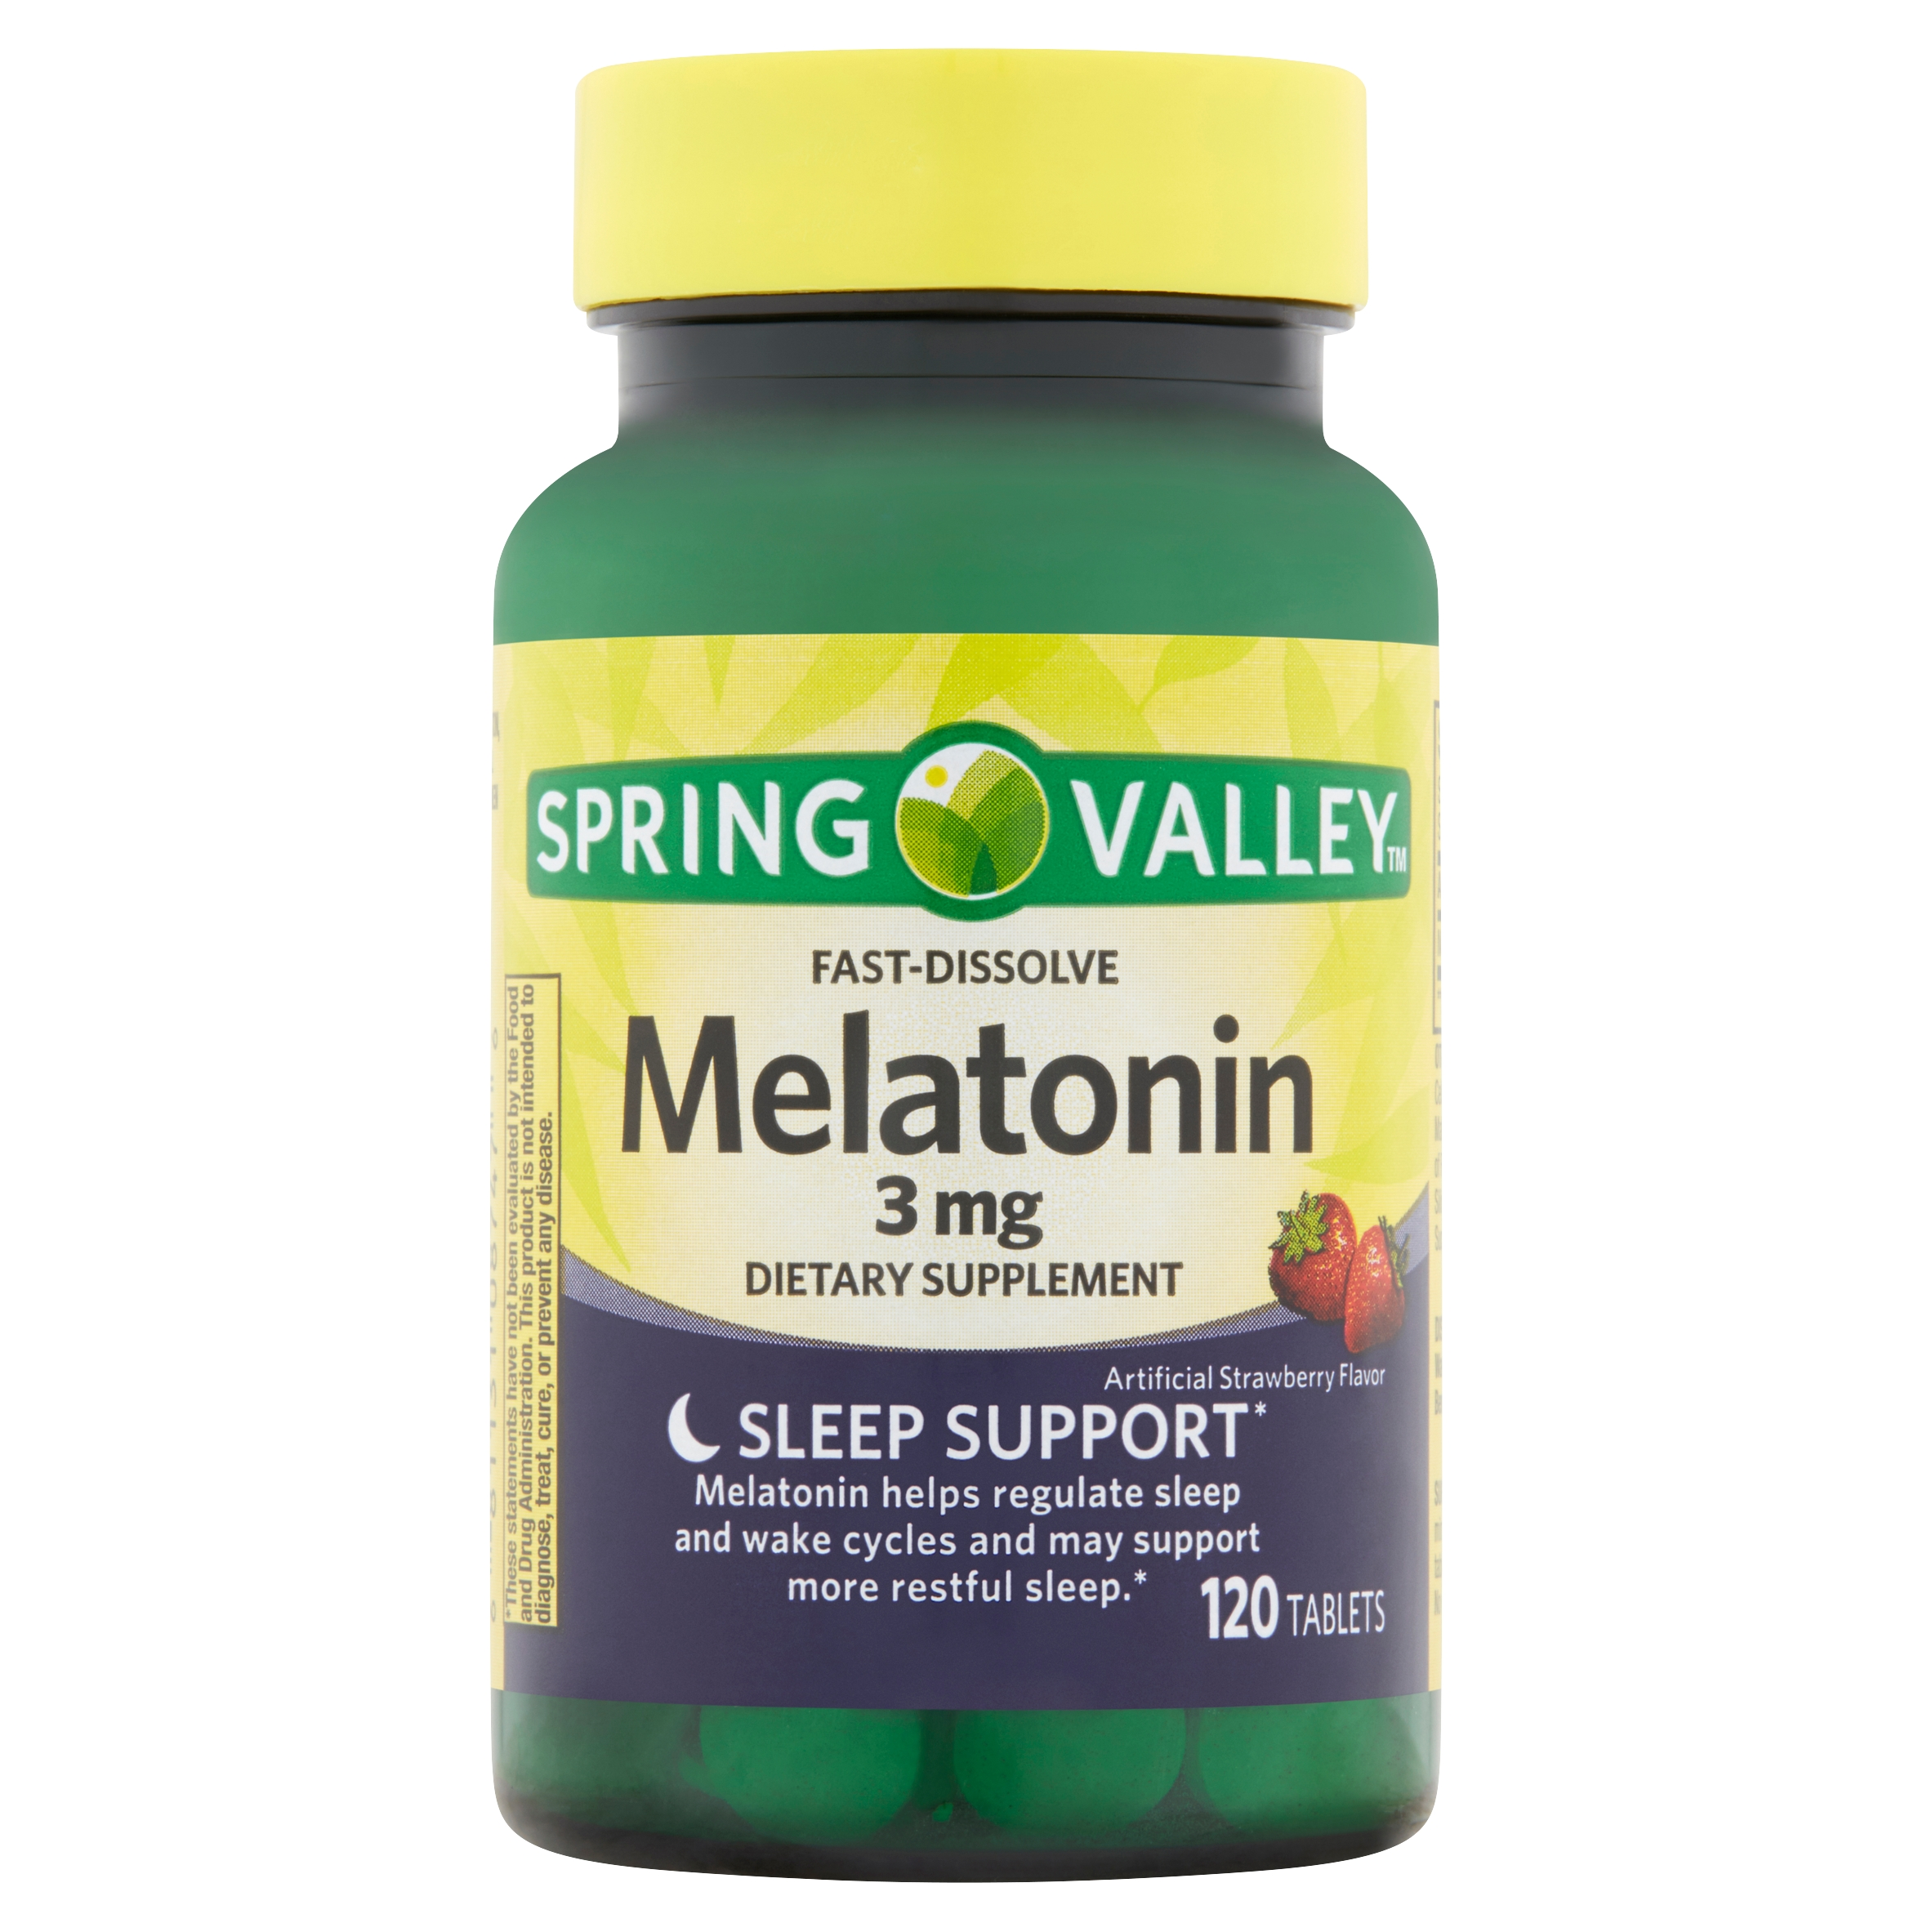 Spring Valley Fast-Dissolve Melatonin Tablets, 3 mg, 120 count -  Walmart.com - Walmart.com